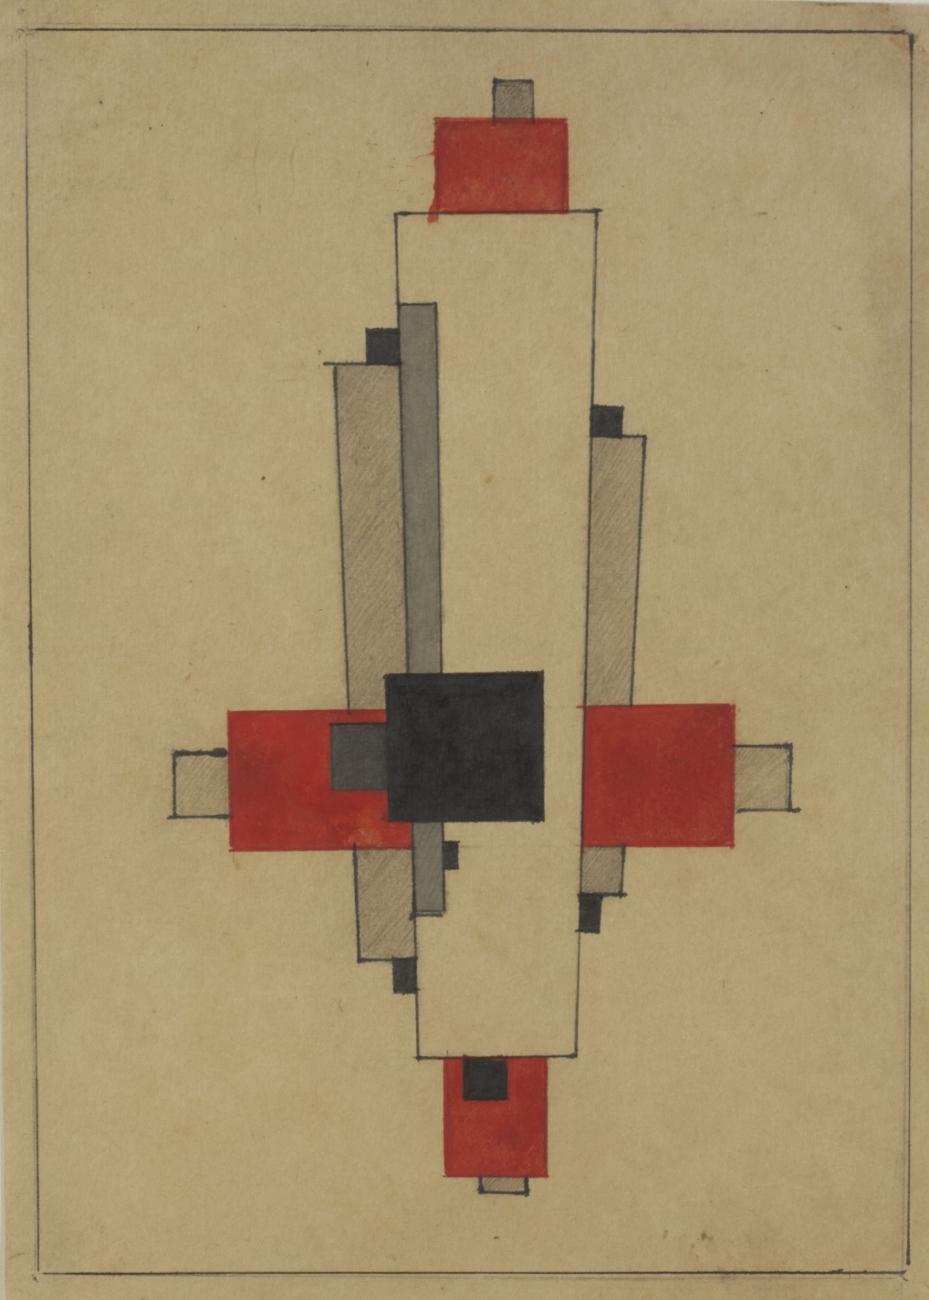 Design for a Suprematist Architecton, 1924-25 - Ilya Chashnik